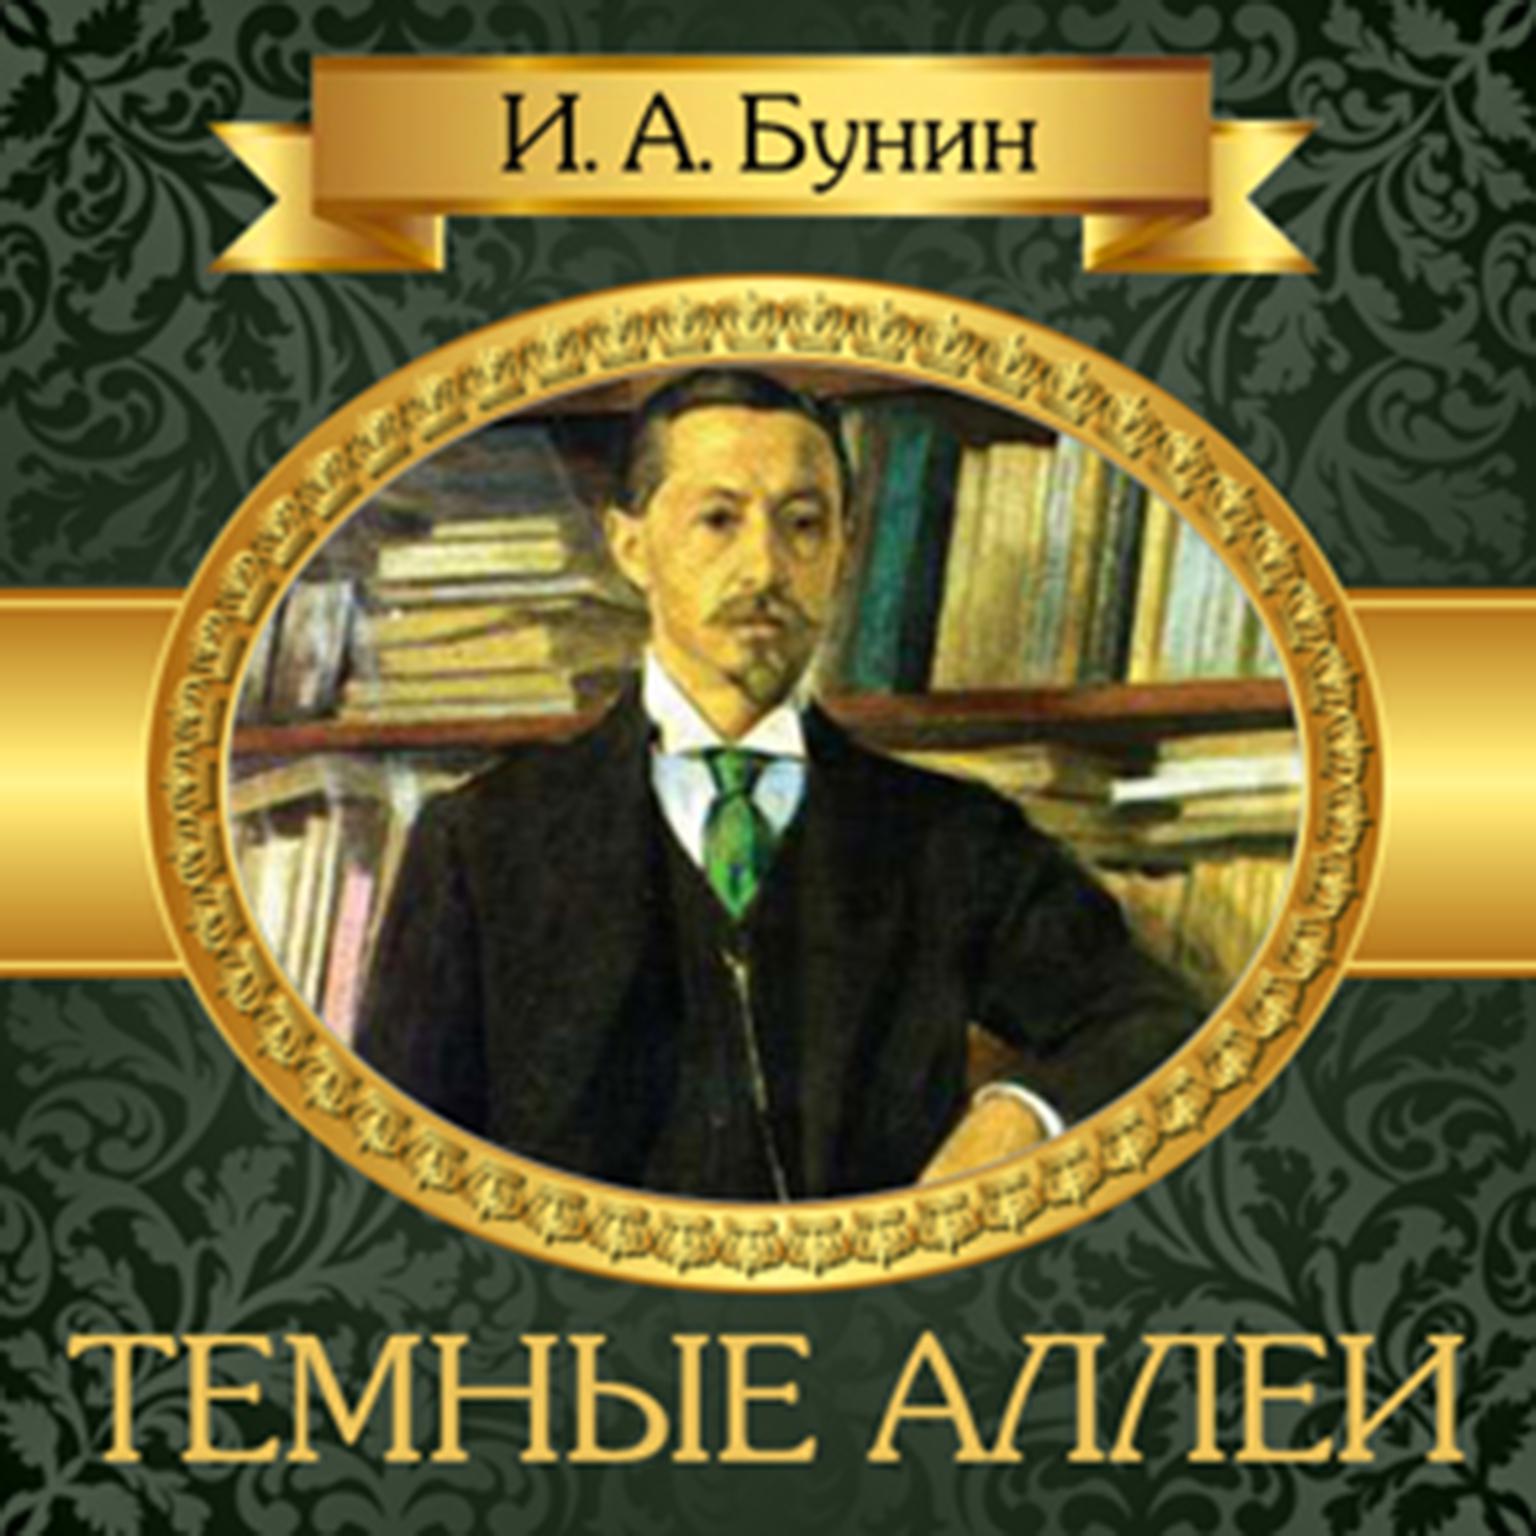 Dark Avenues [Russian Edition] Audiobook, by Ivan Bunin